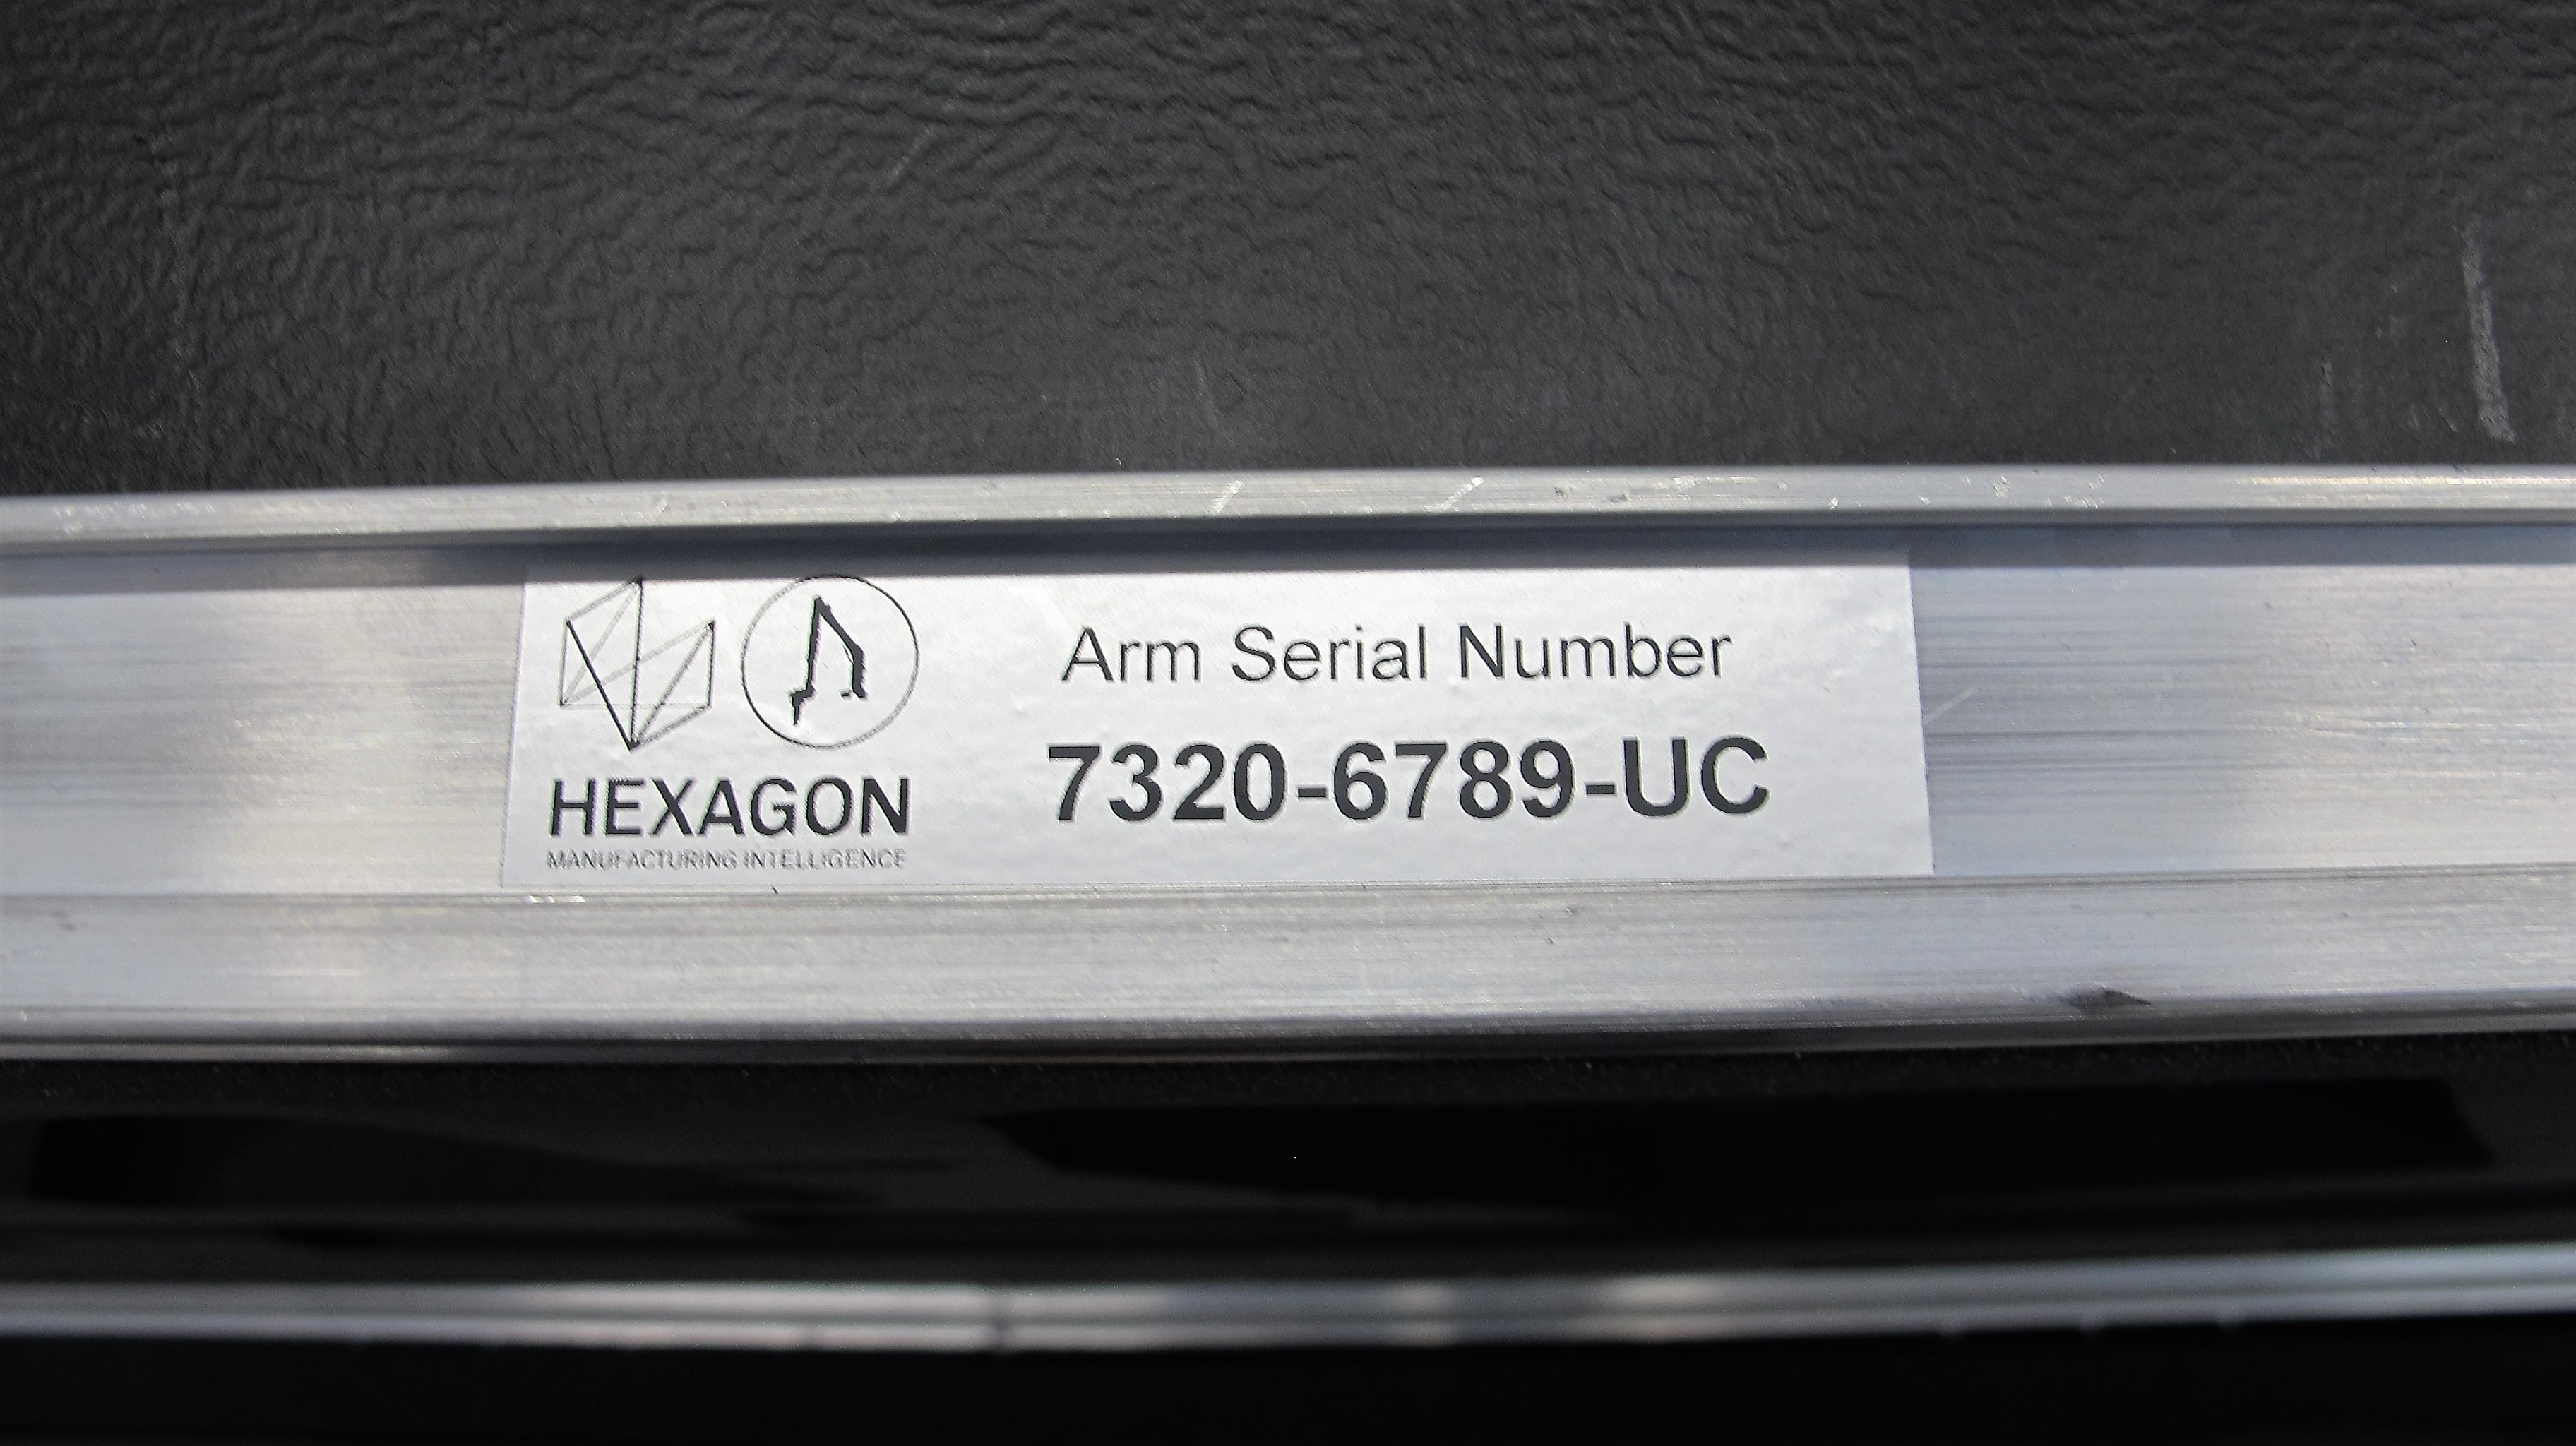 Lot 1 - 2017 ROMER 7300 ABSOLUTE ARM PORTABLE CMM, S/N 7320-6780-UC (LIKE NEW), W/HEXAGON HP-L-8. 9 LASER